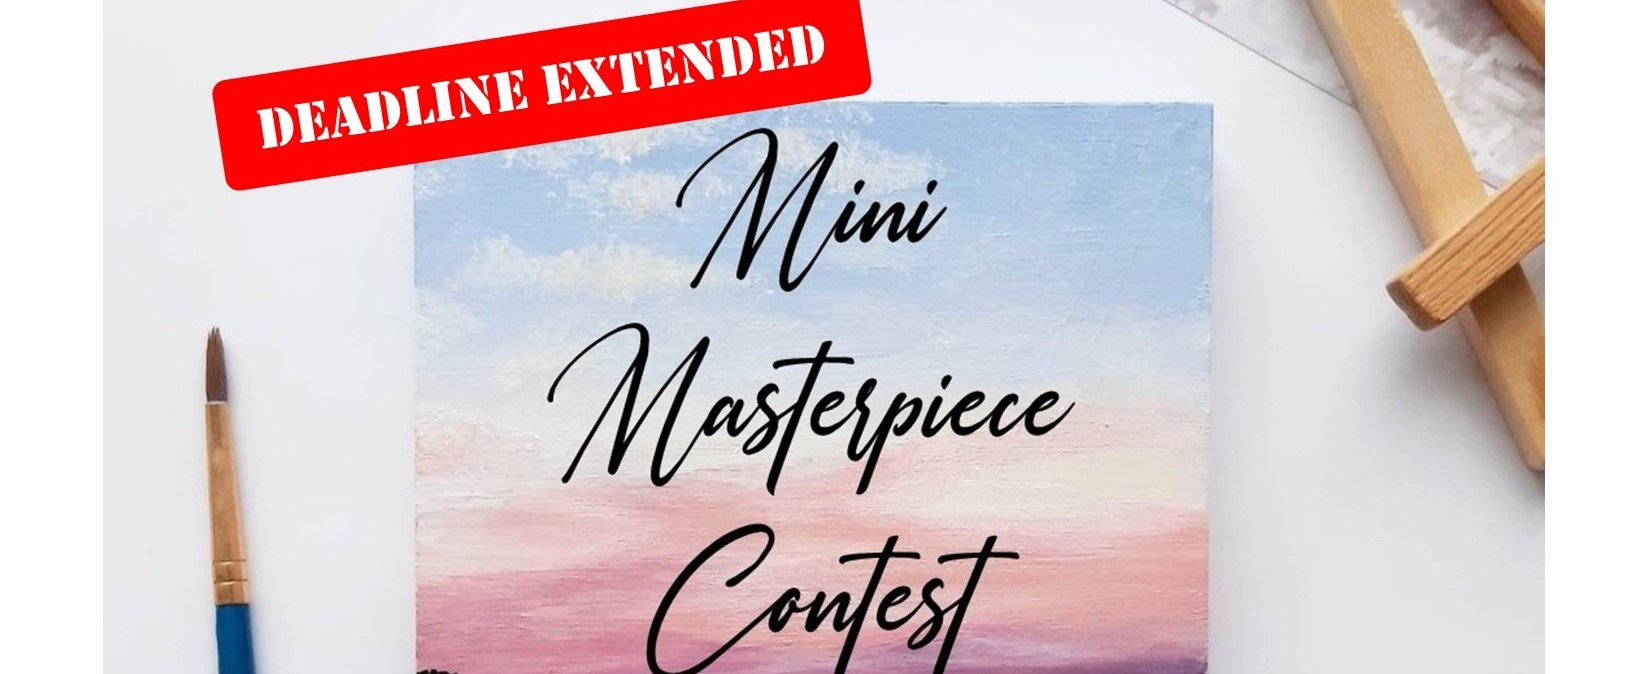 More entries, please!